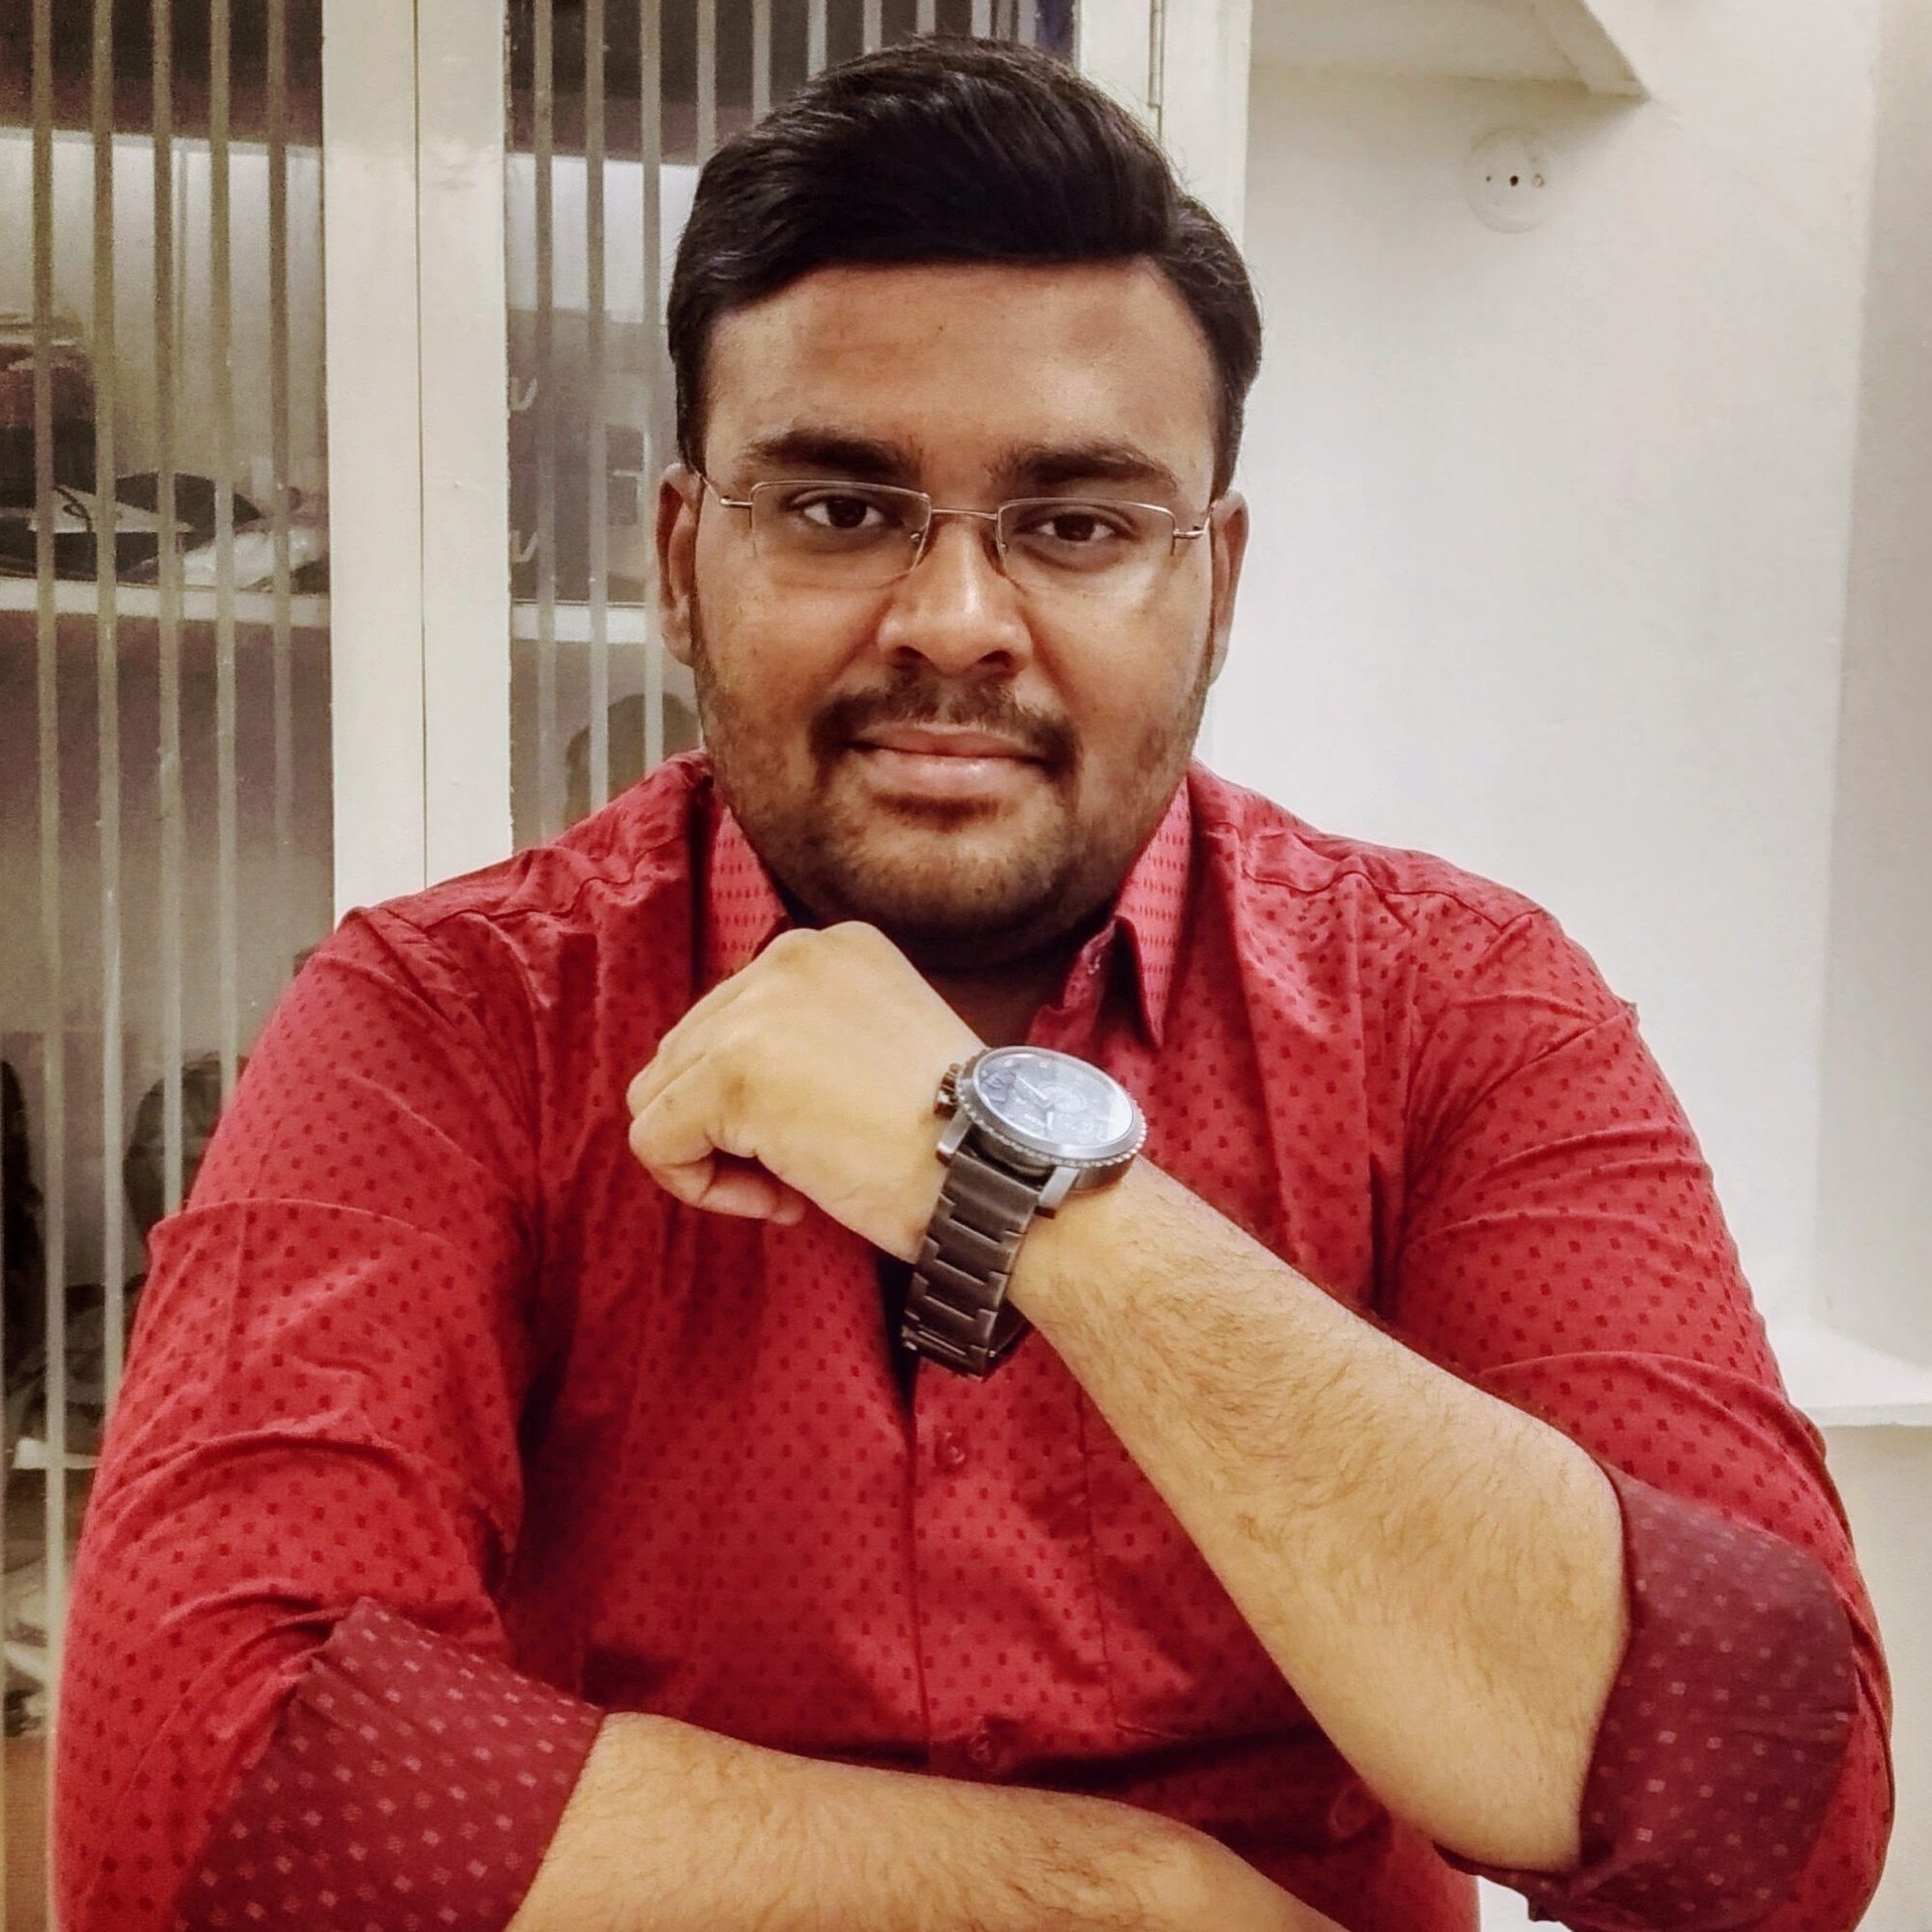 Avinash Katta